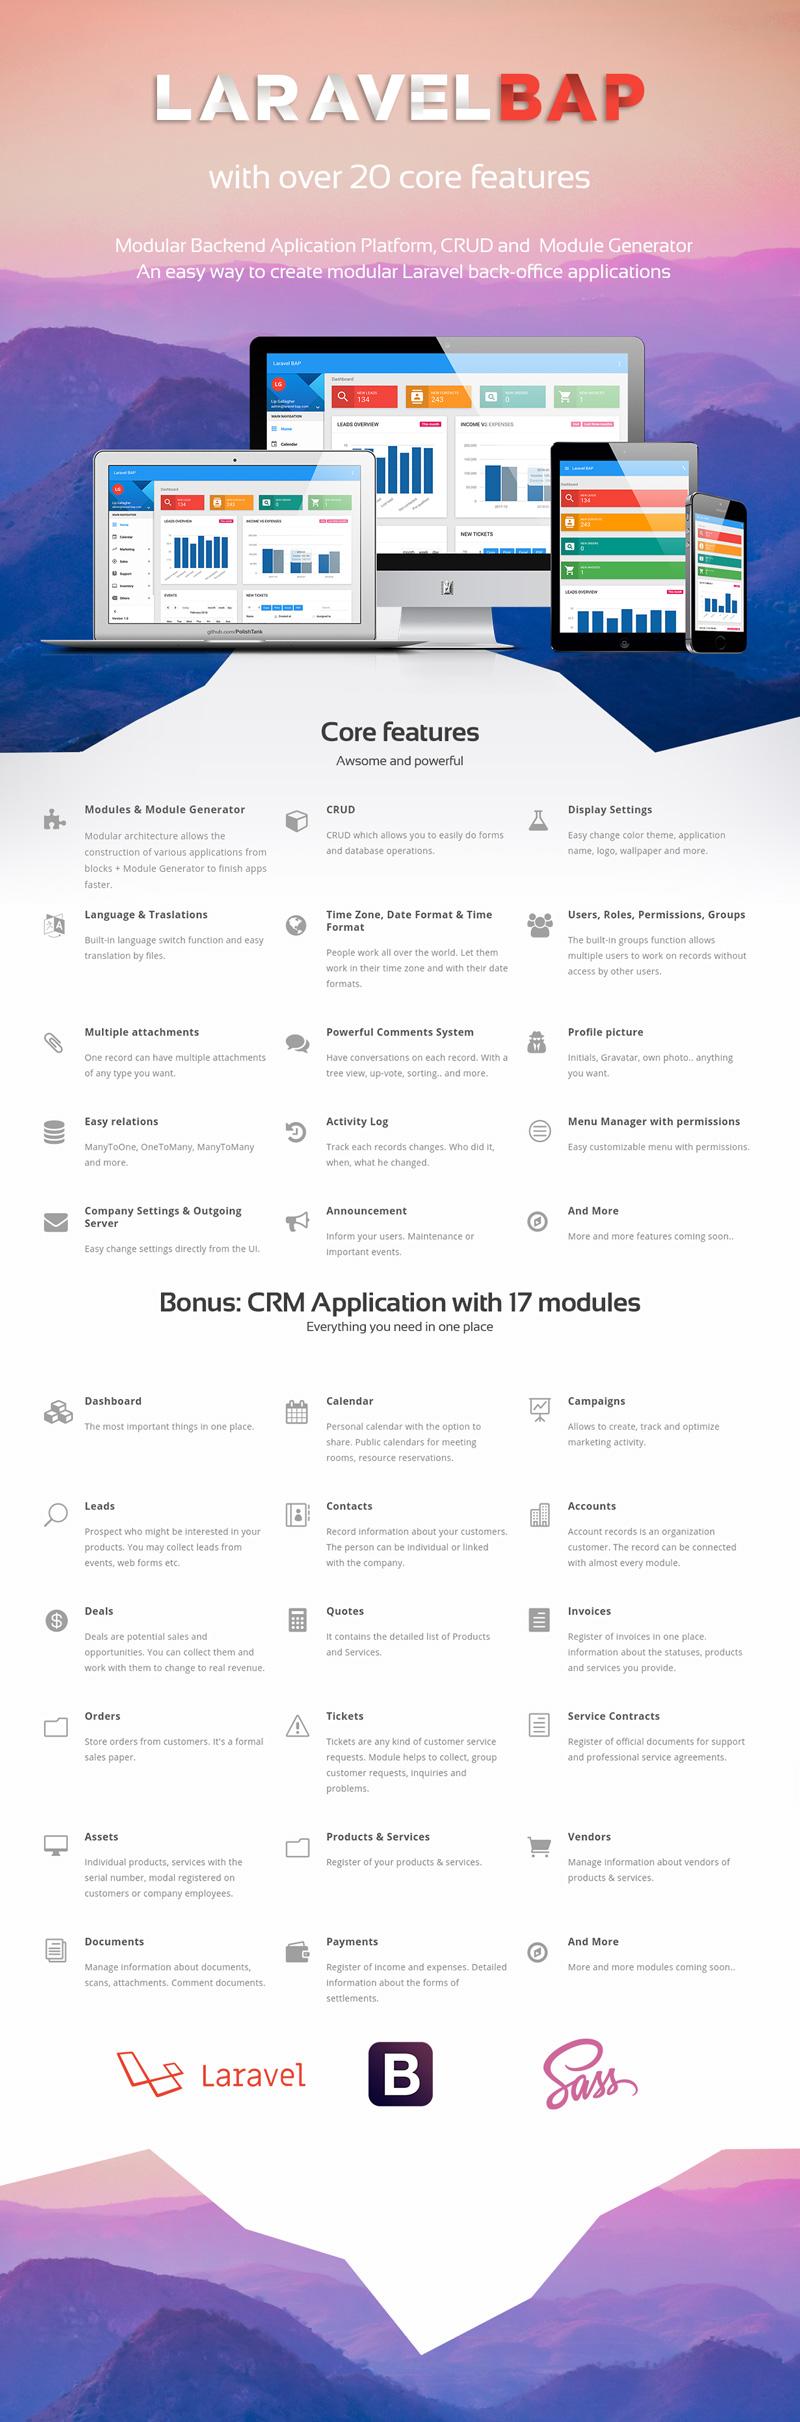 Laravel BAP - Modular Application Platform and CRM - 1